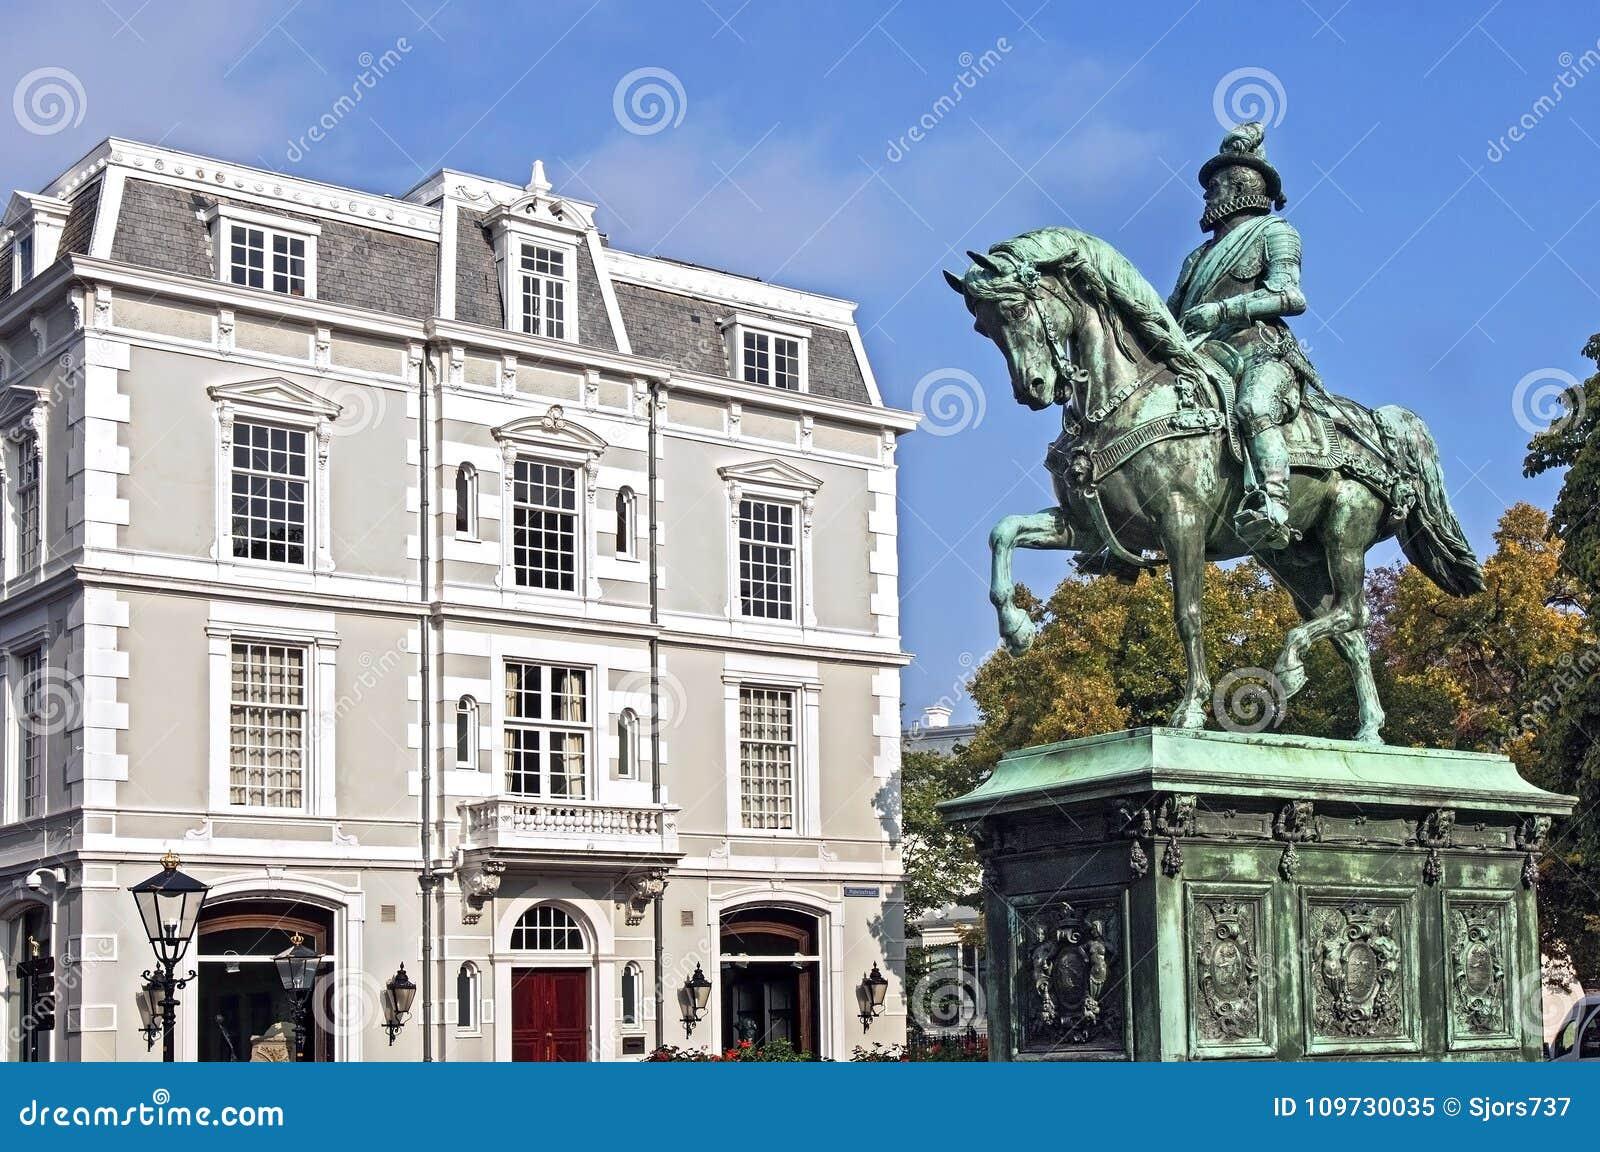 Statue William of Orange and old building The Hague